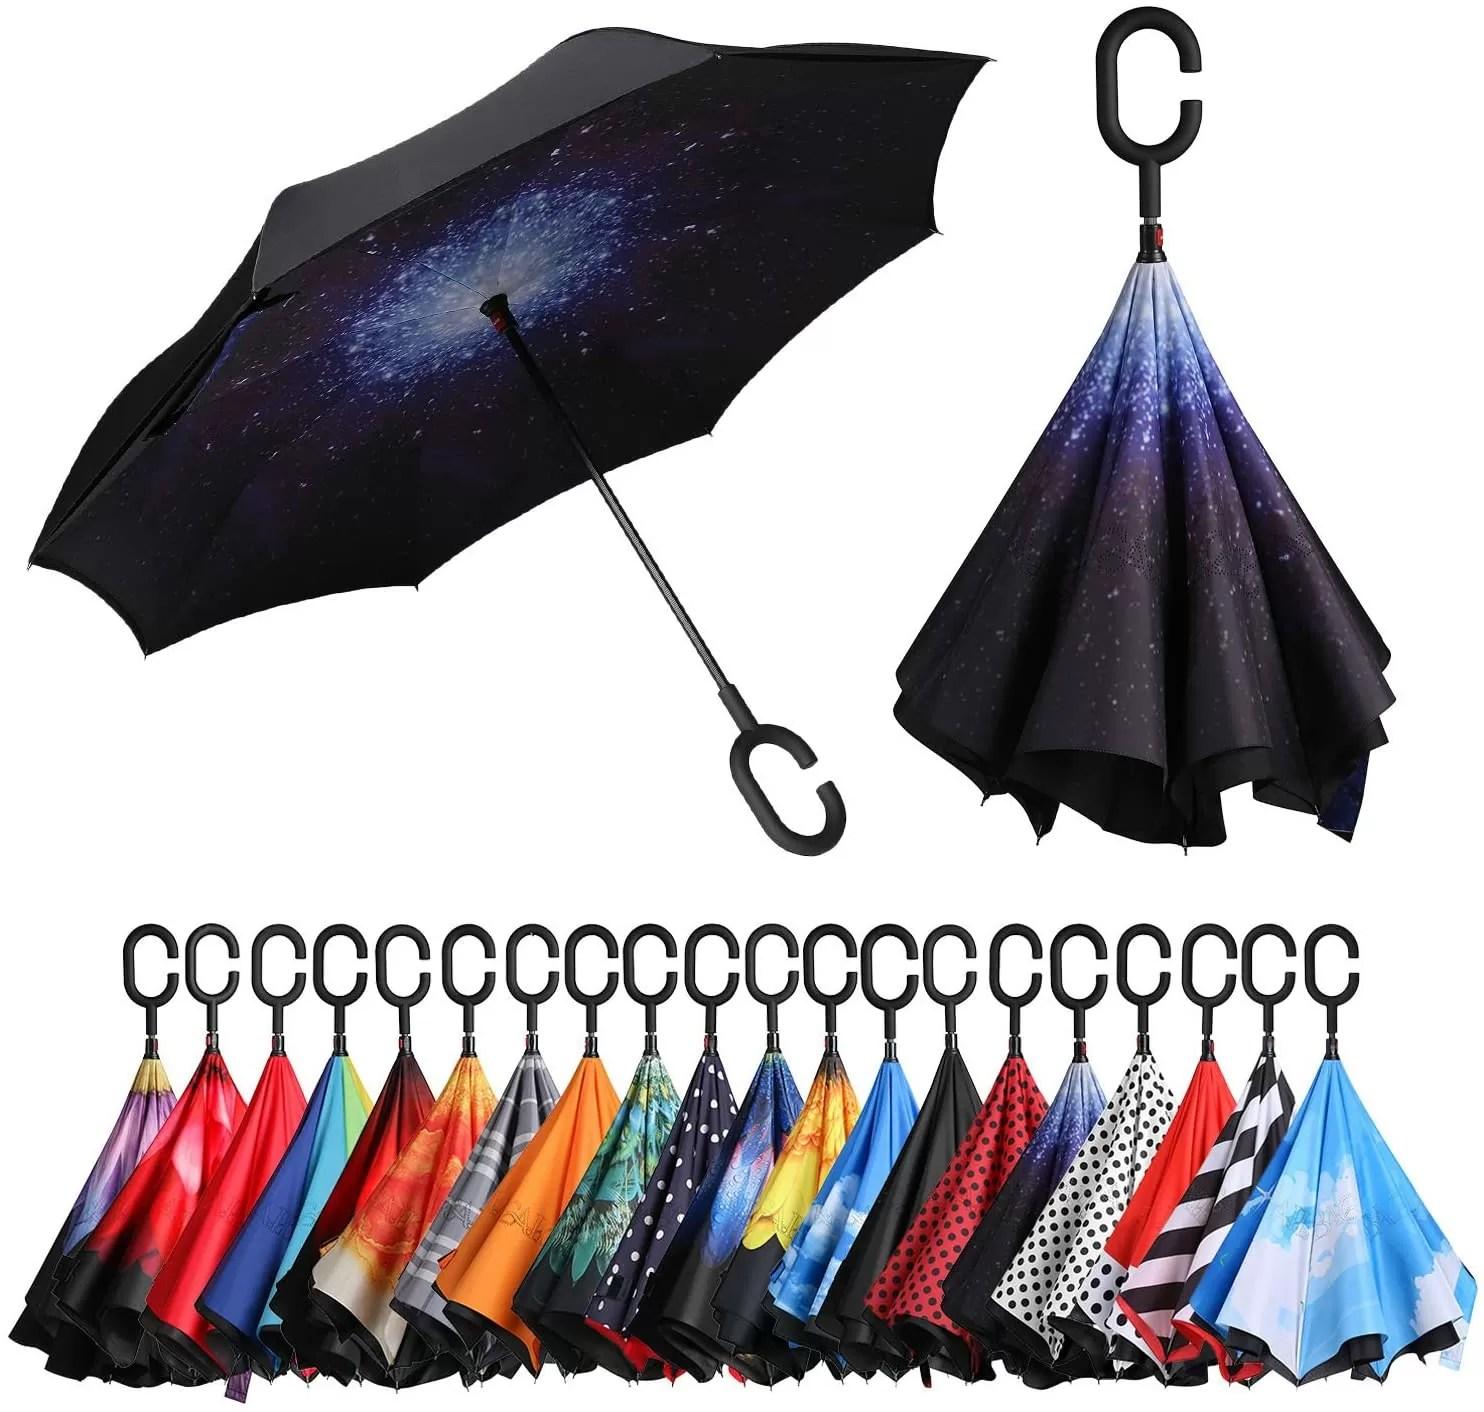 Eono inverted umbrella with C-shaped handle